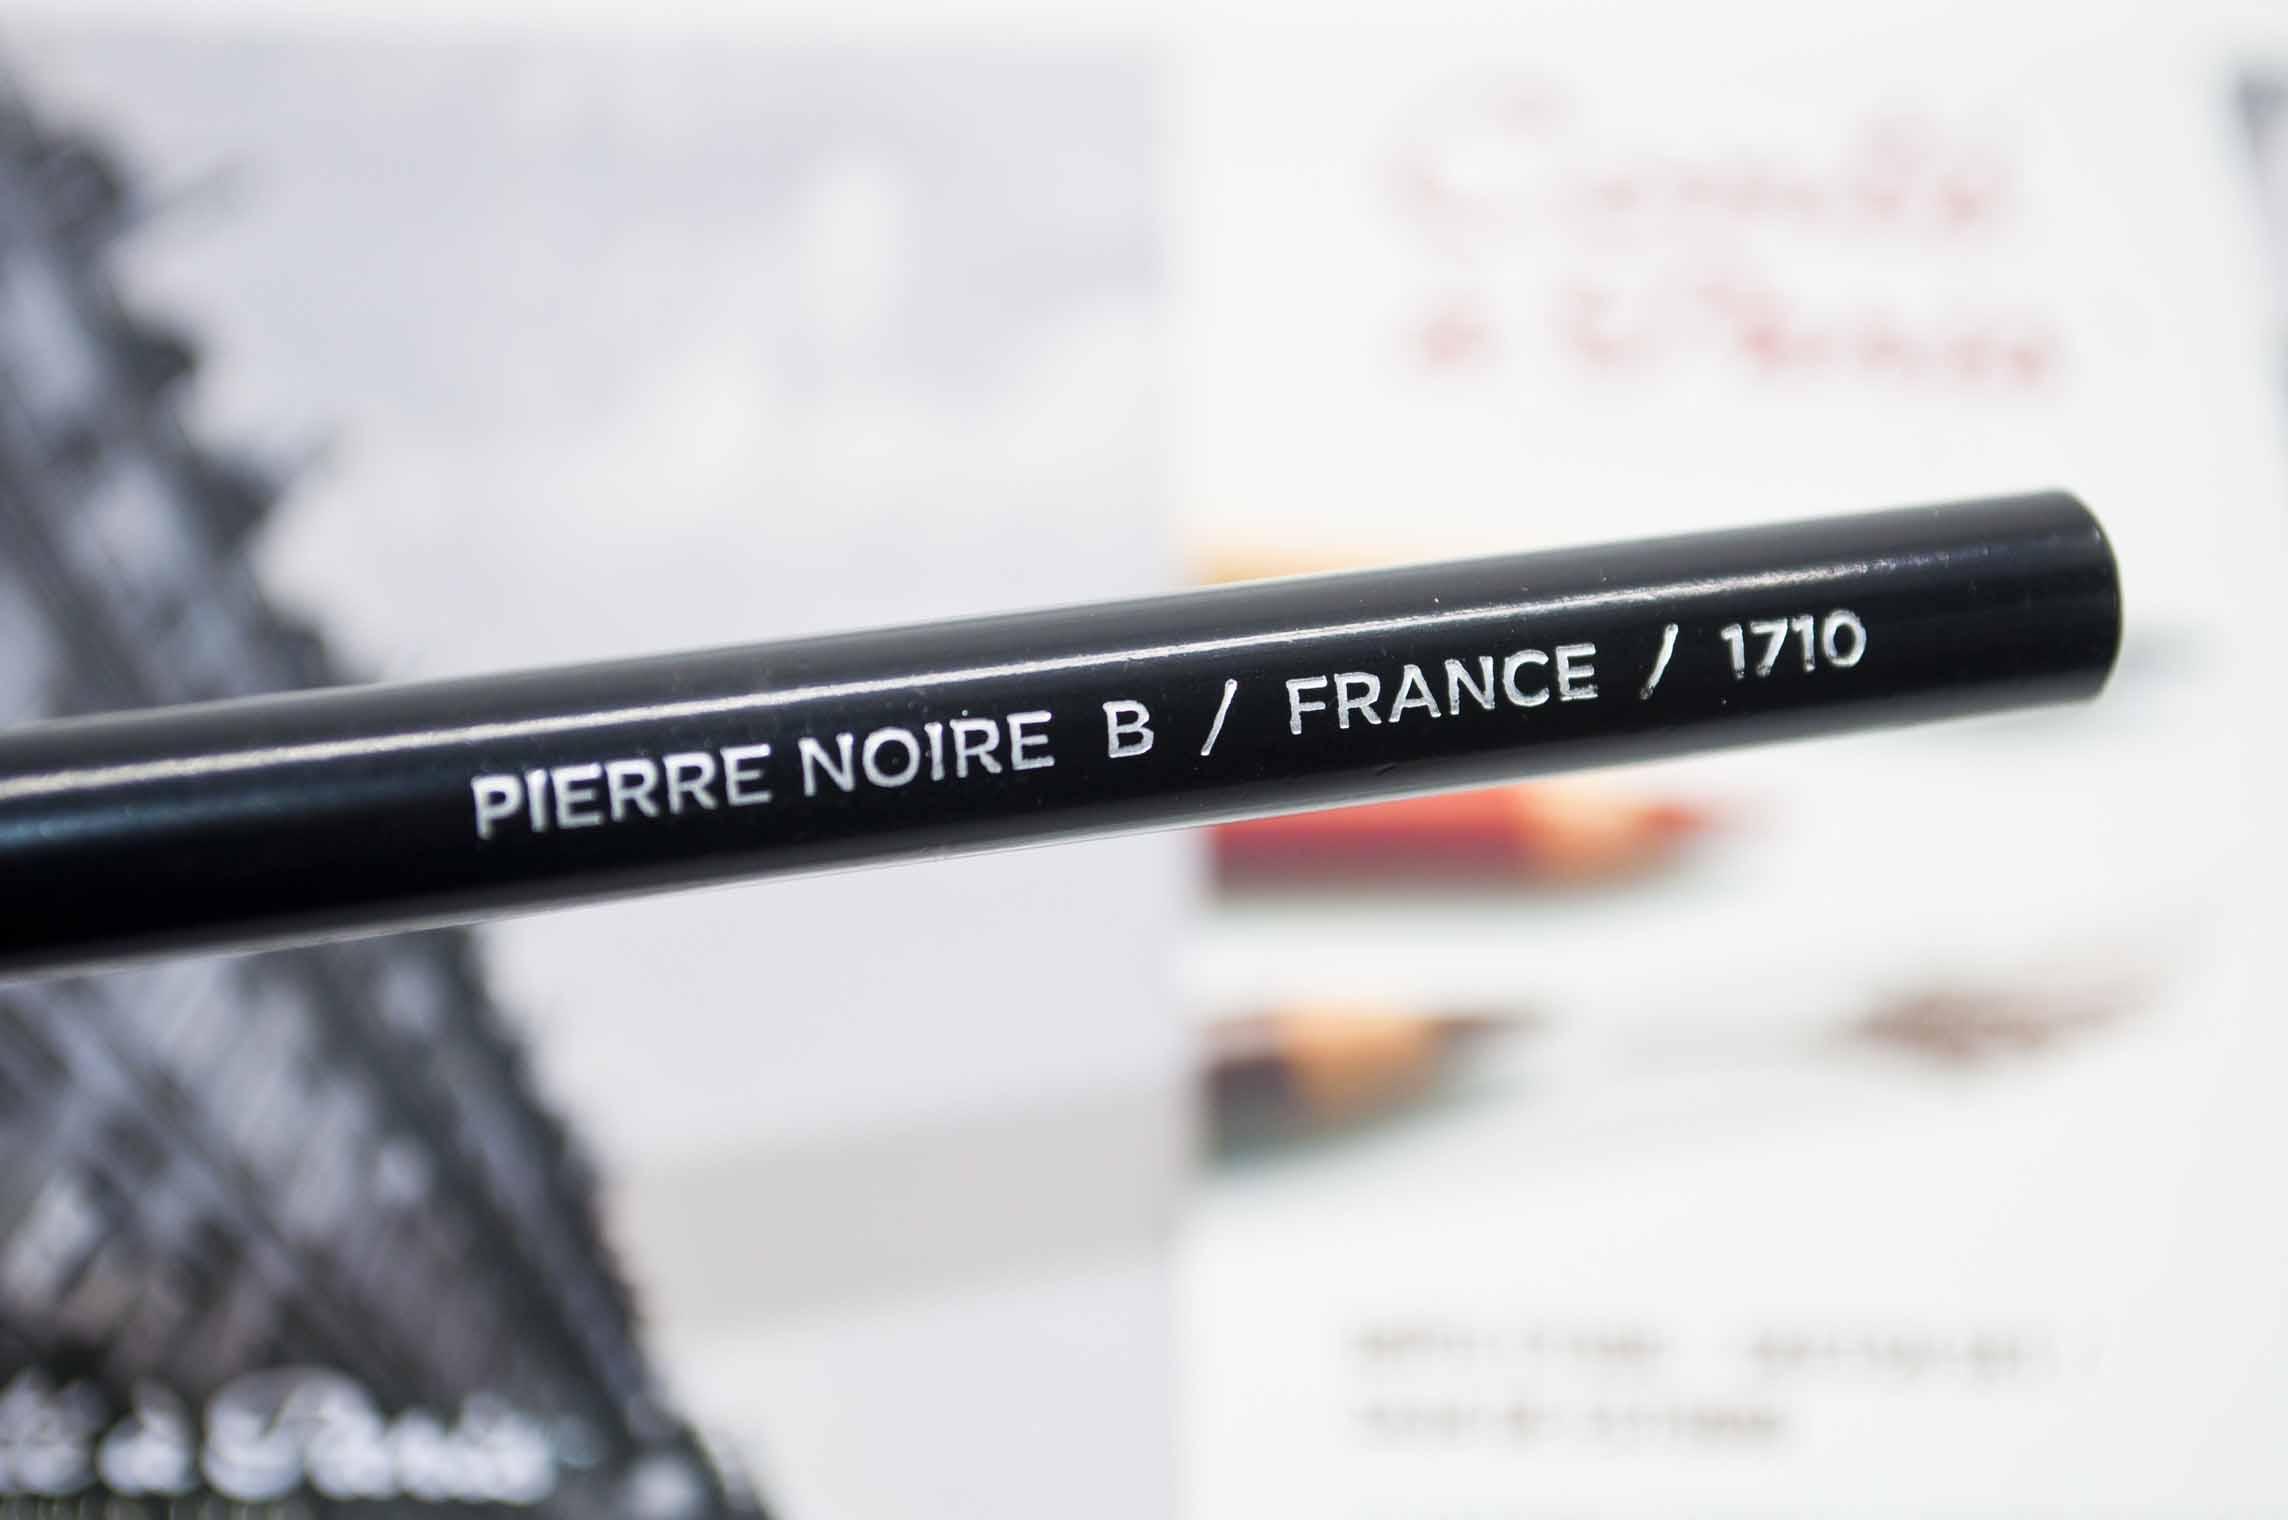 Conte Pierre Noire.jpg